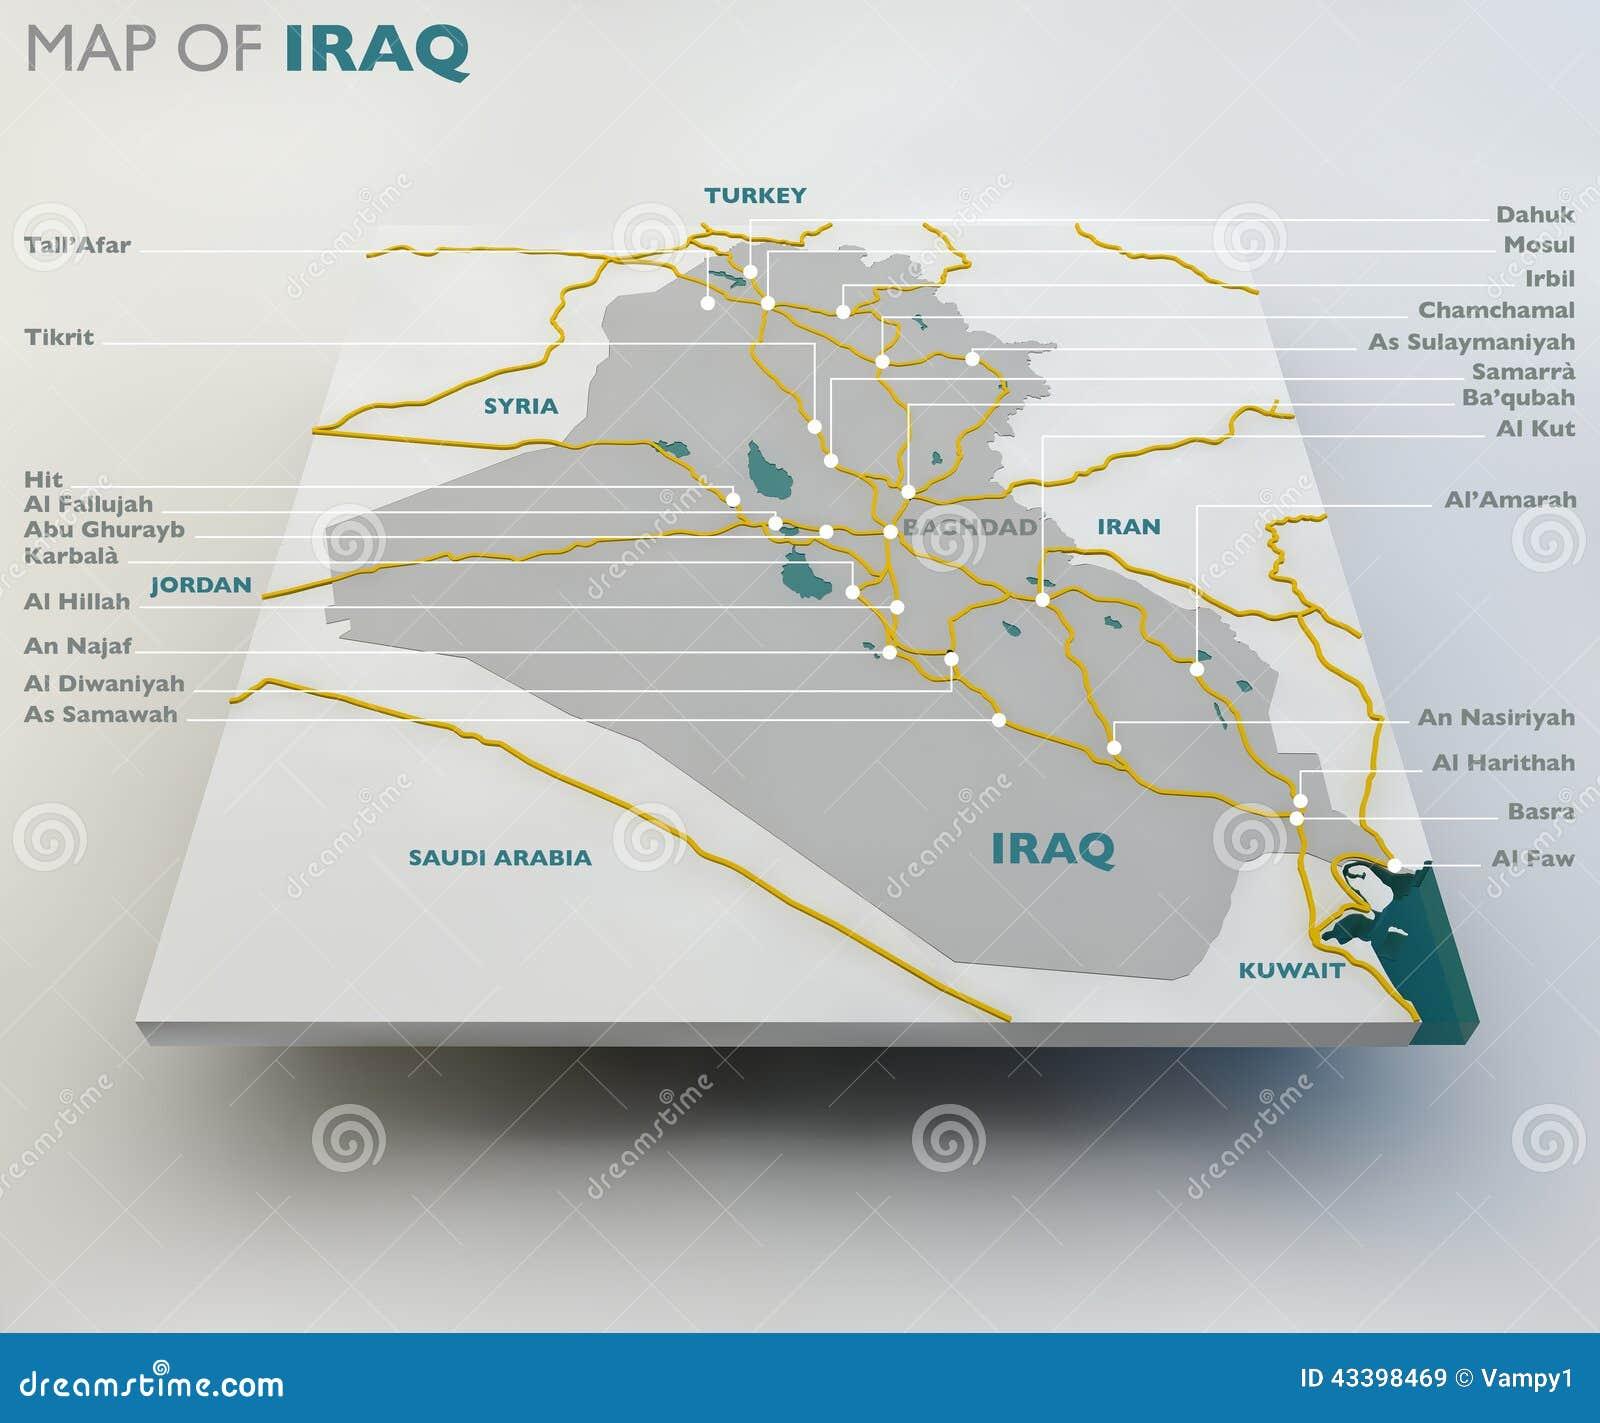 Map Of Iraq The Iraqi State Boundaries Roads And Cities Stock